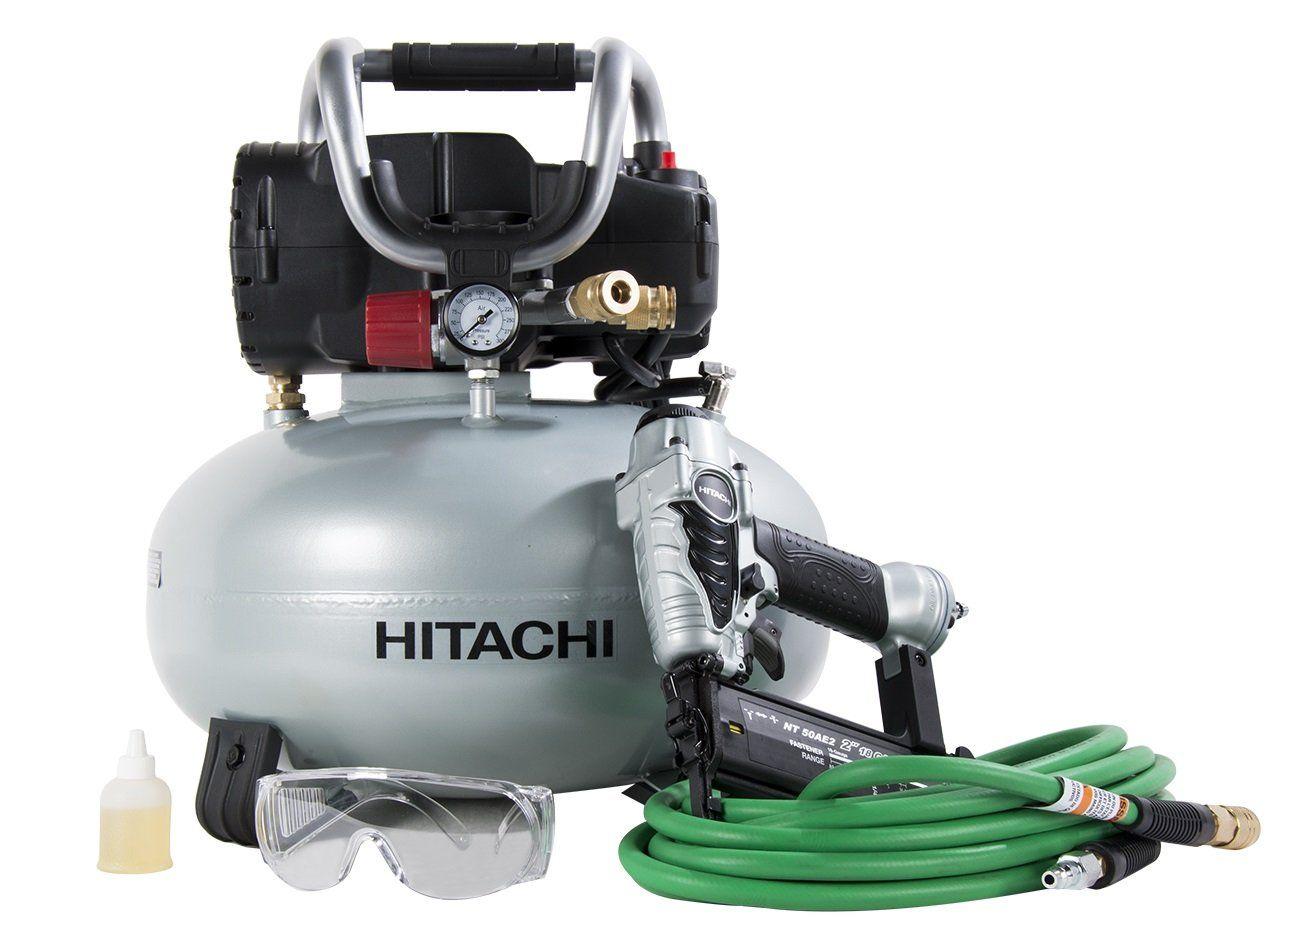 Hitachi Knt50ab Brad Nailer And Compressor Combo Kit 6 Gallon Pancake Air Tank 5 8 To 2 Brad Nail Best Portable Air Compressor Combo Kit Pancake Compressor